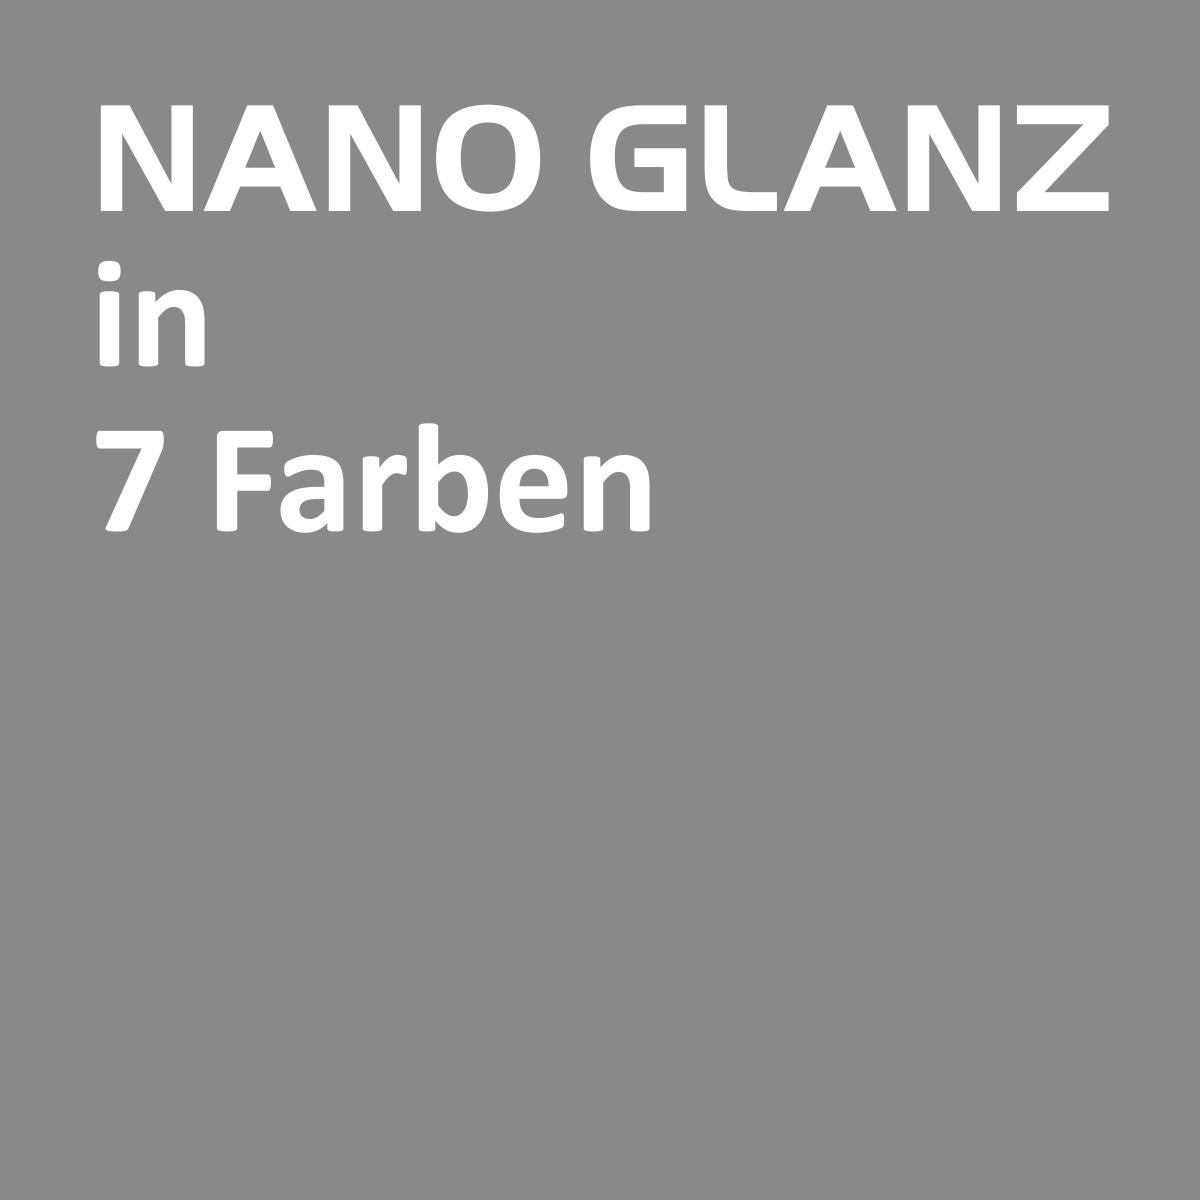 Nano Glanz_1 Text